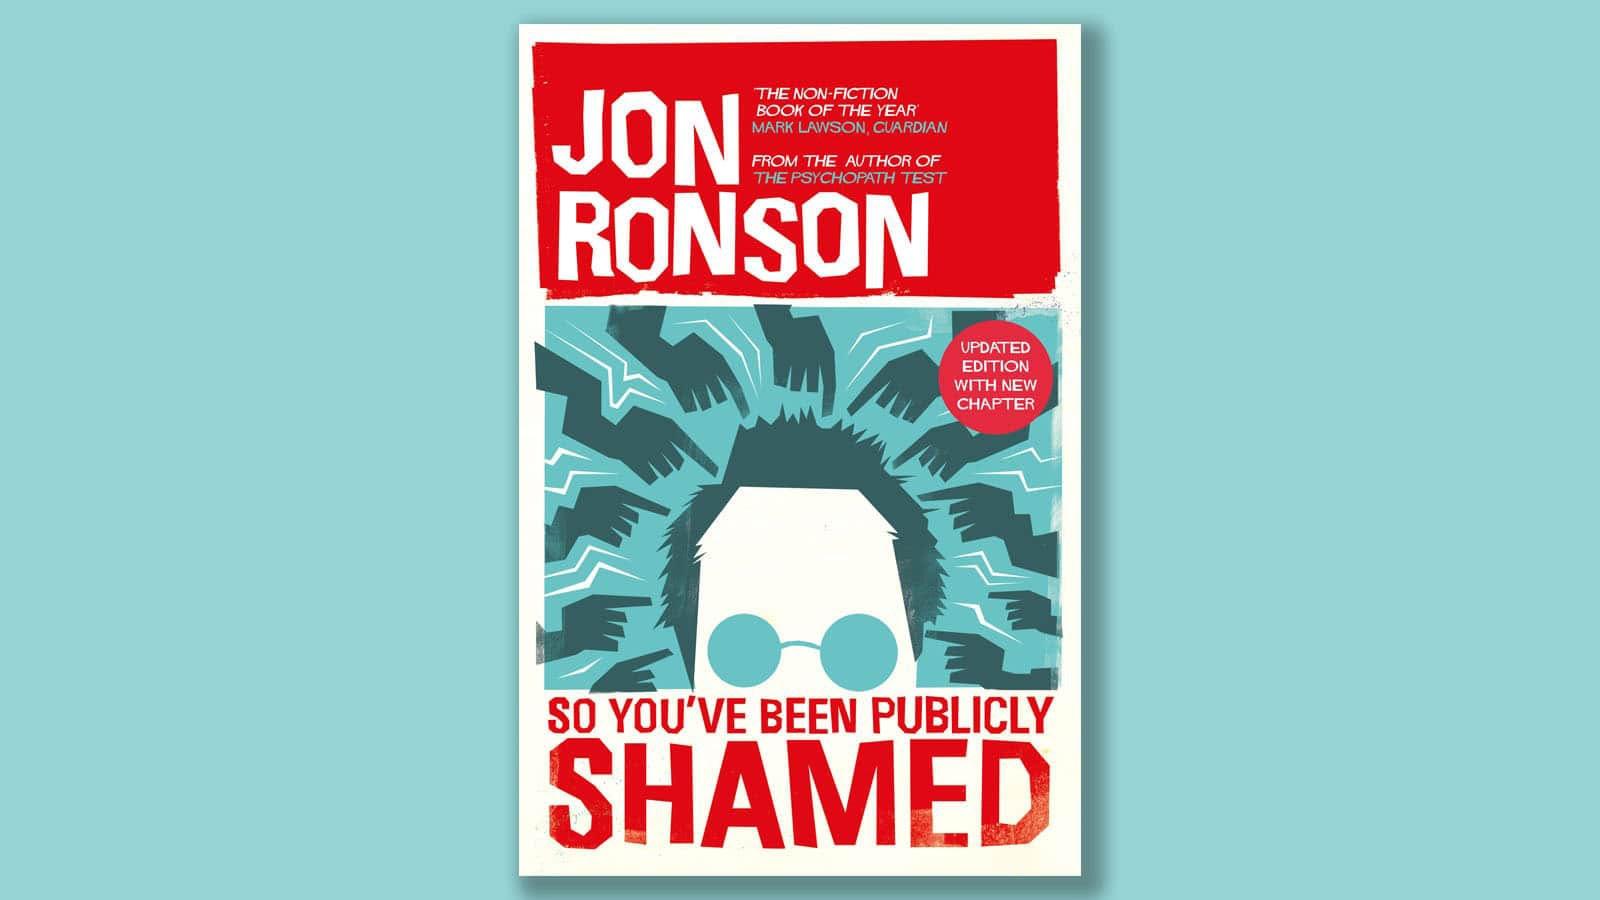 Jon Ronson's So You've Been Publicly Shamed on a light blue background.